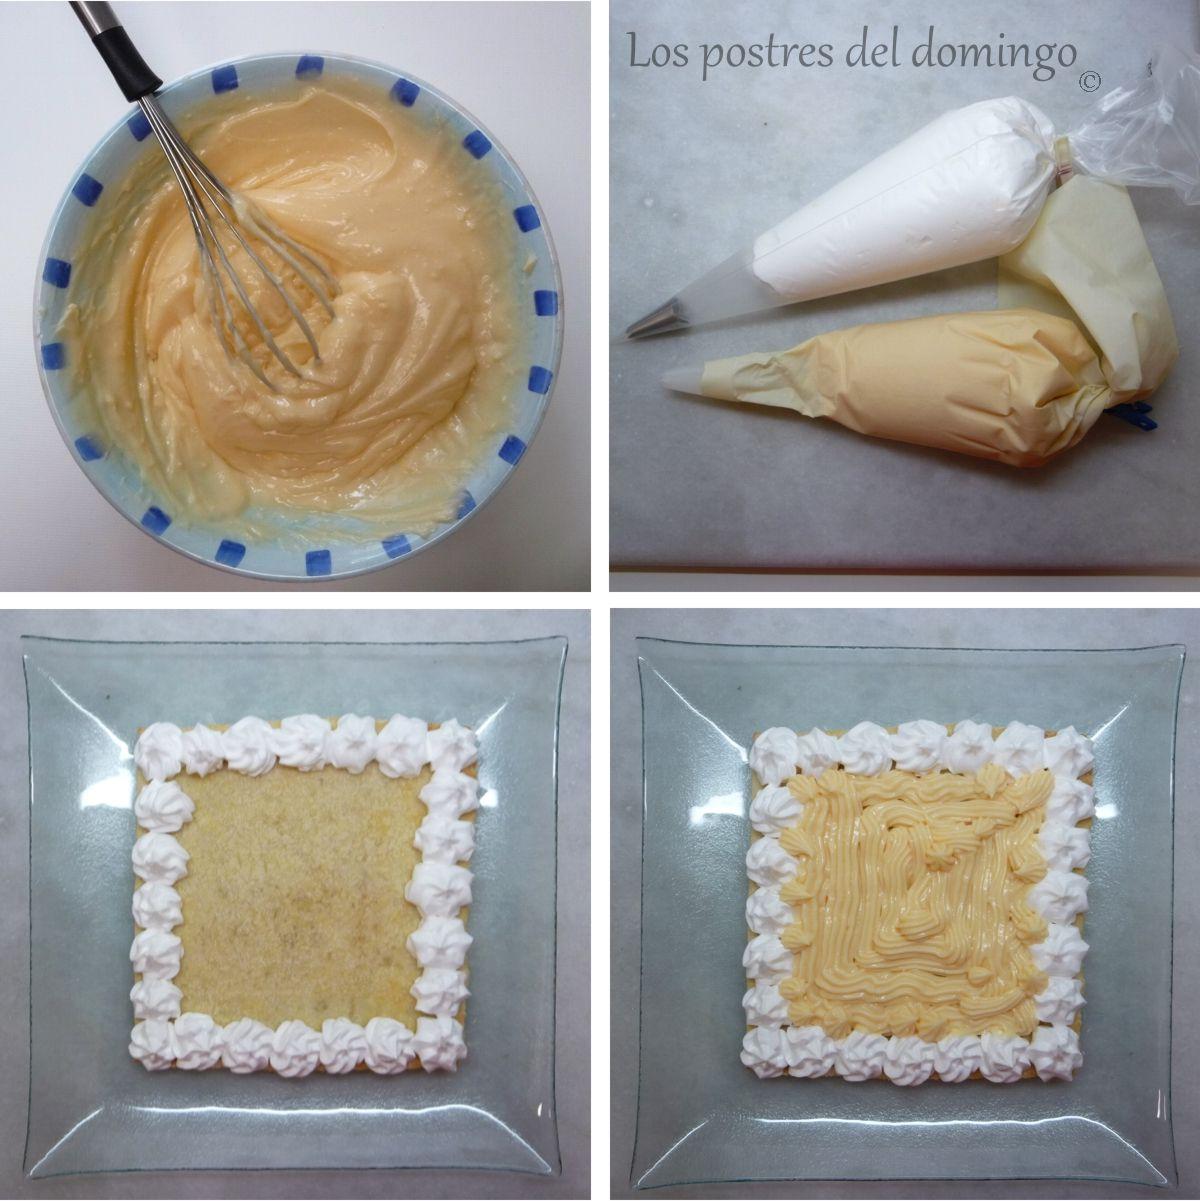 tarta de hojaldre y crema_montaje